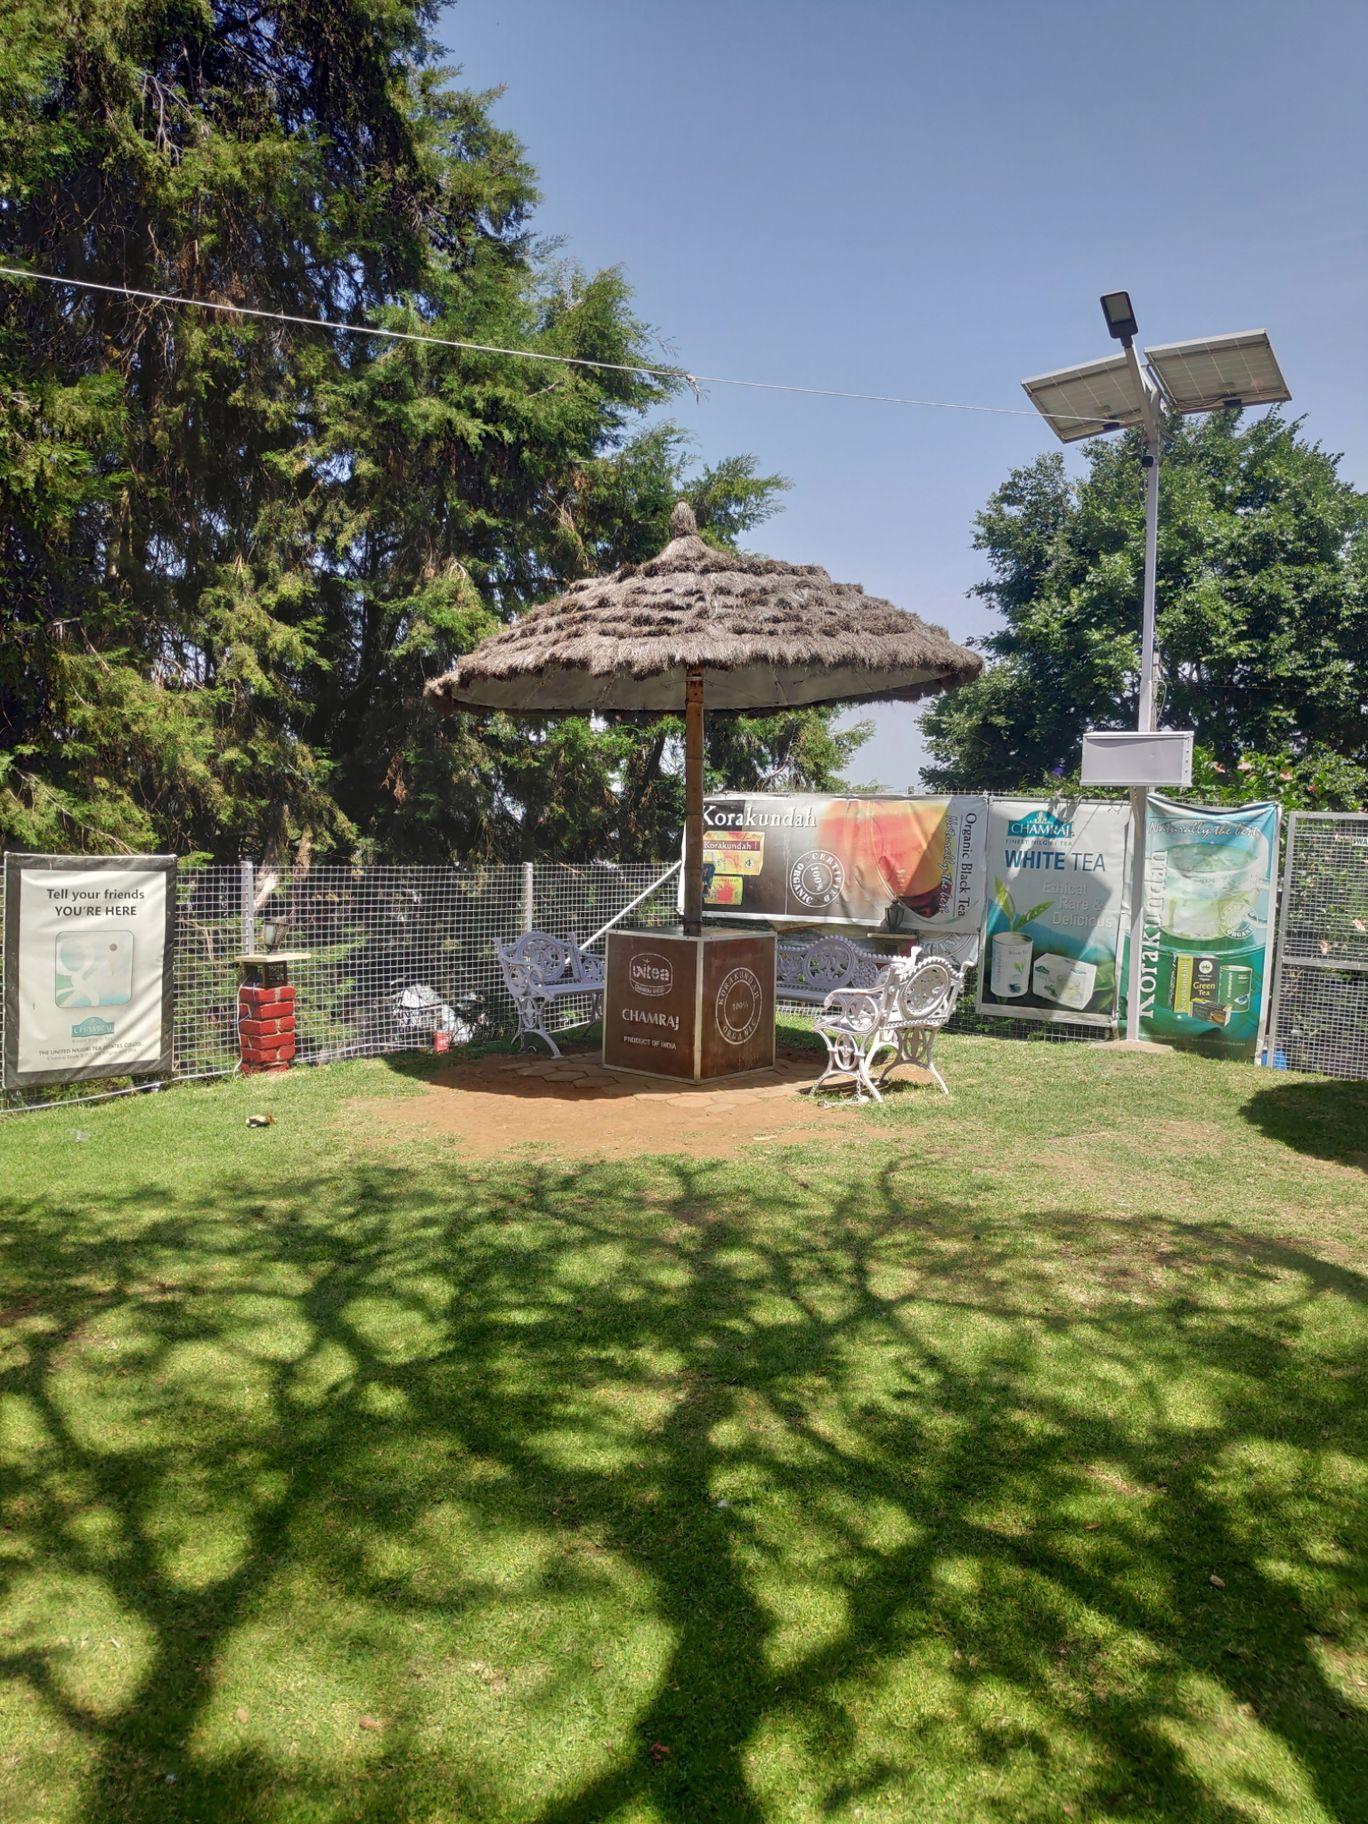 Photo of Chamraj Tea Center By Tanjul Sarkar